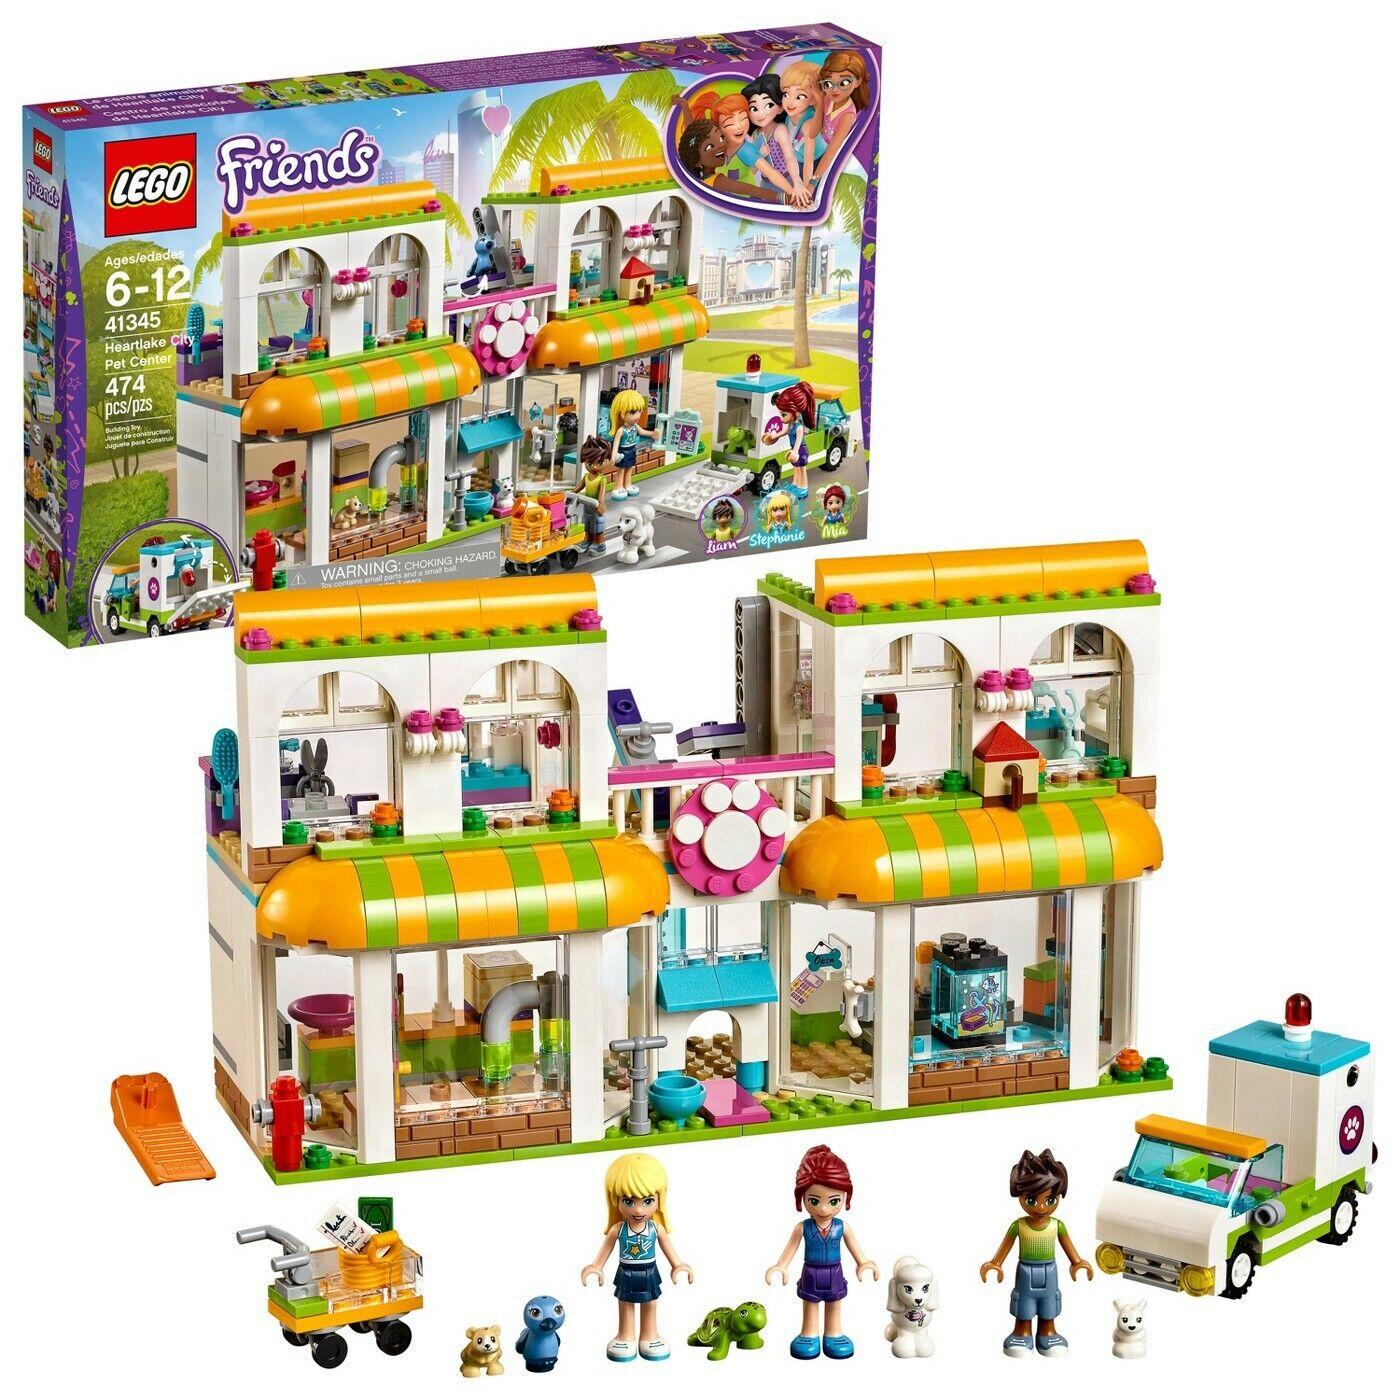 Pet City Friends 41345 Center Set Heartlake Lego Building oxBdeC